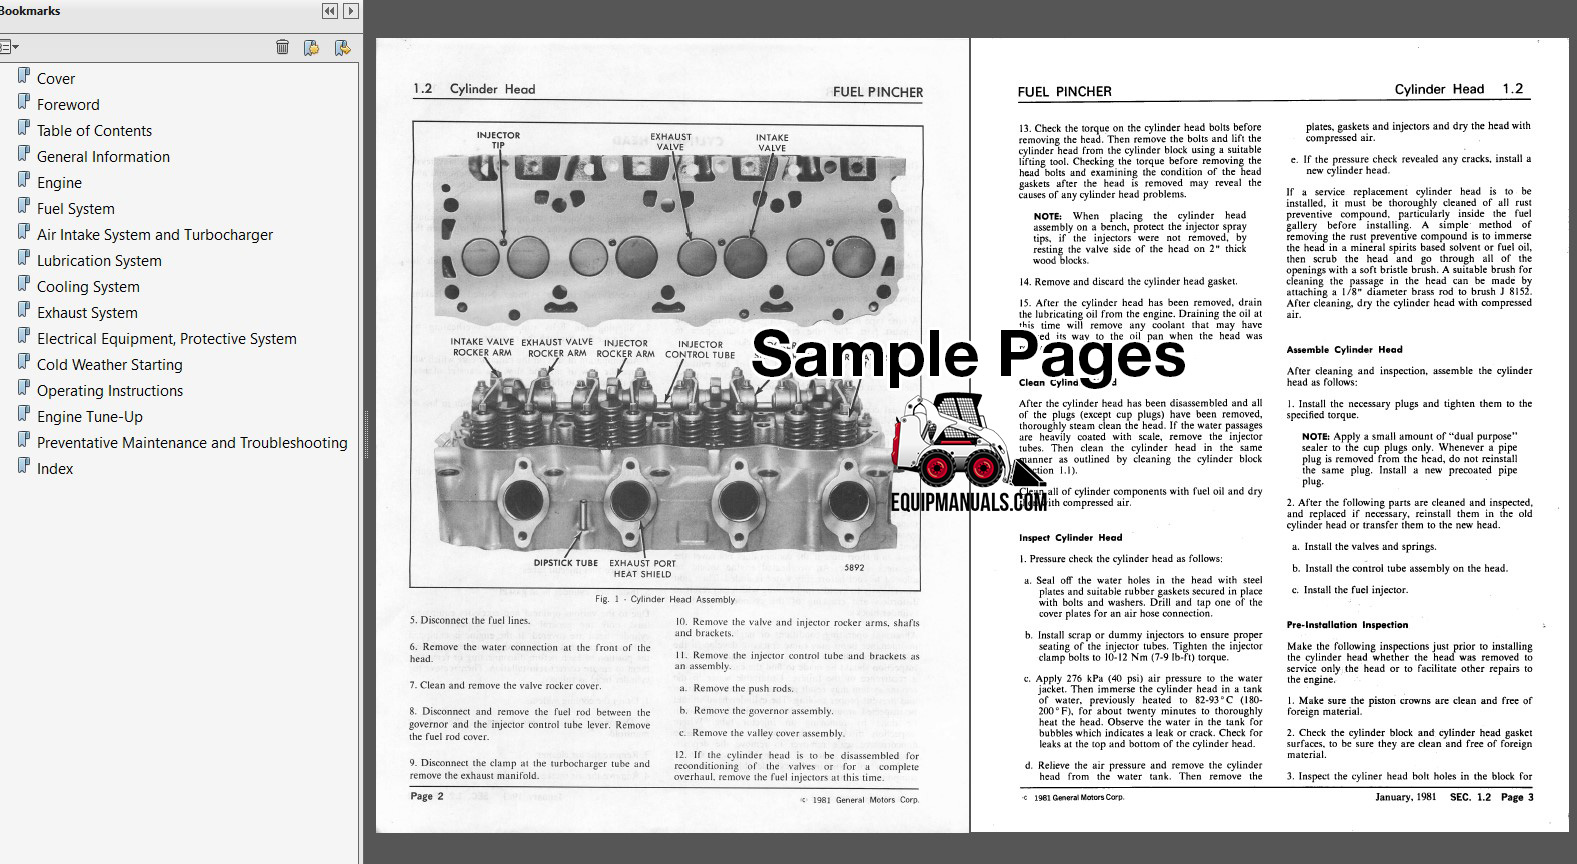 Detroit Diesel 8.2L Fuel Pincher Engine Repair Manual